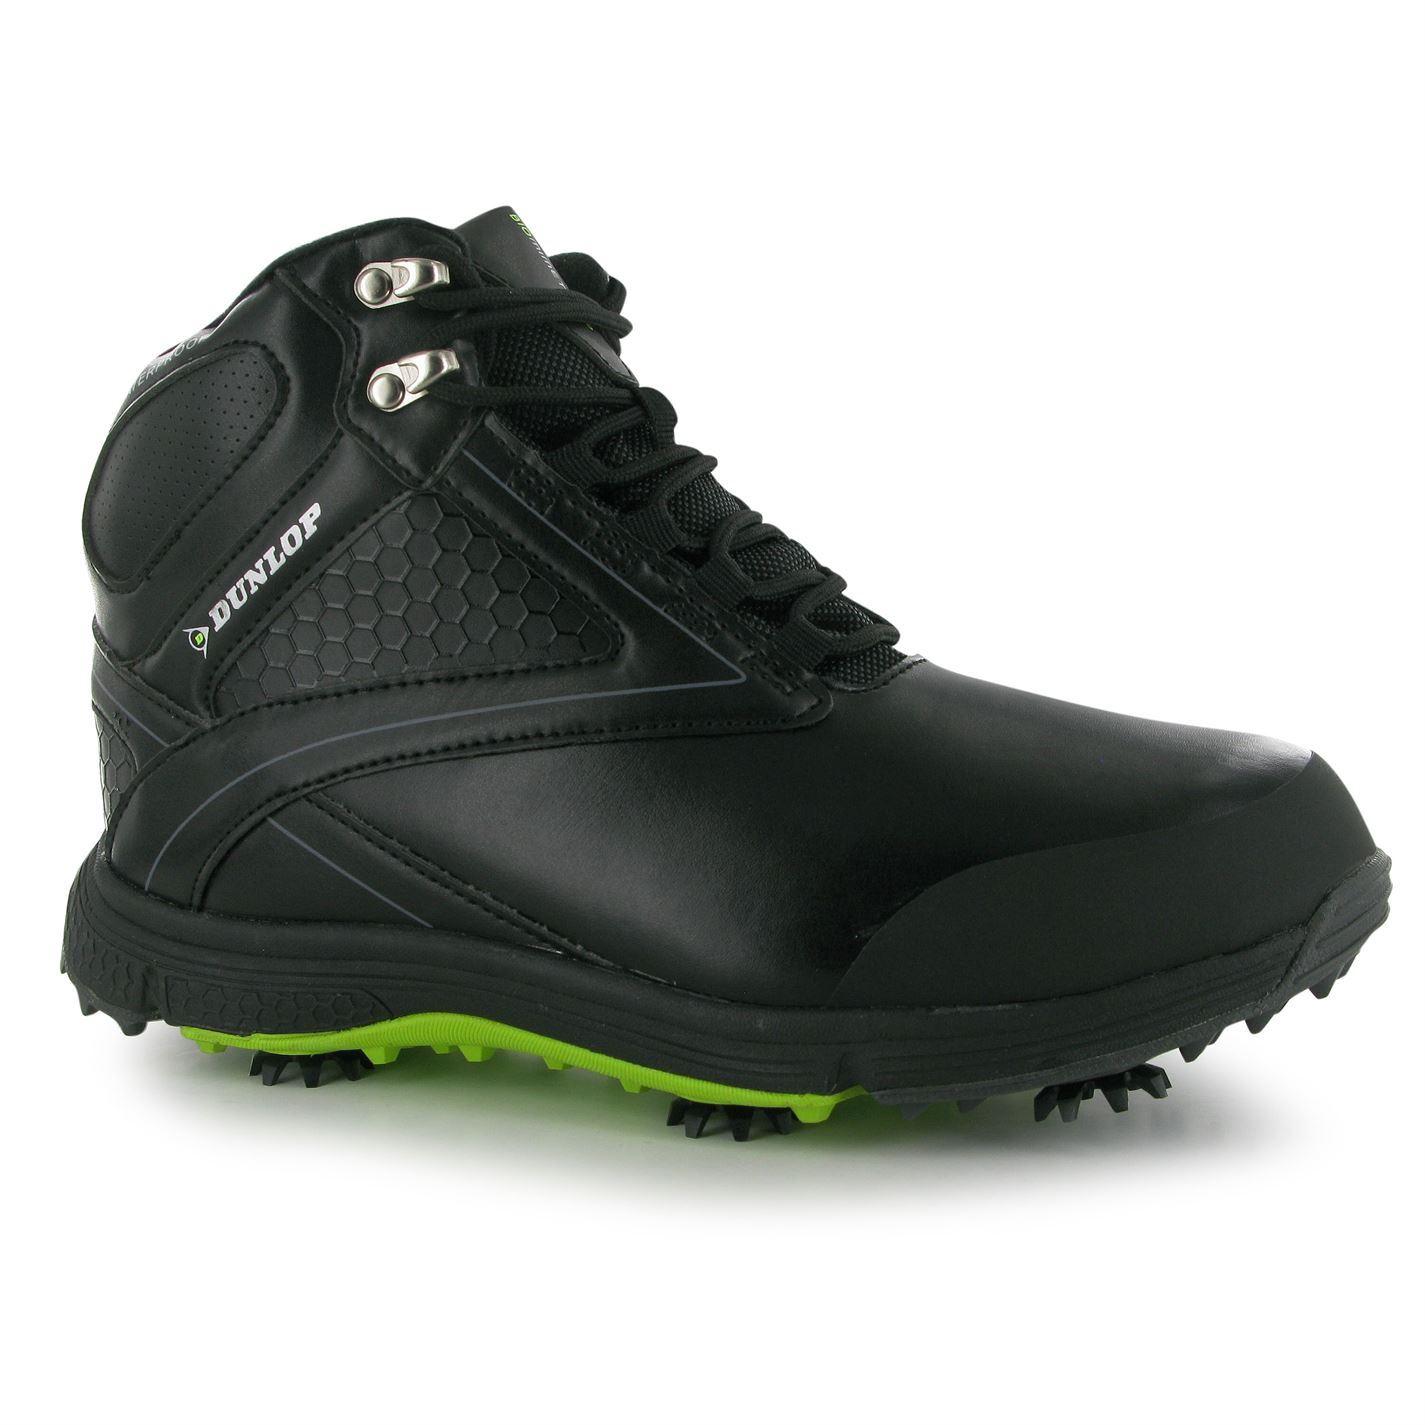 Dunlop Waterproof Leather Biomimetic  Mens Golf Shoes